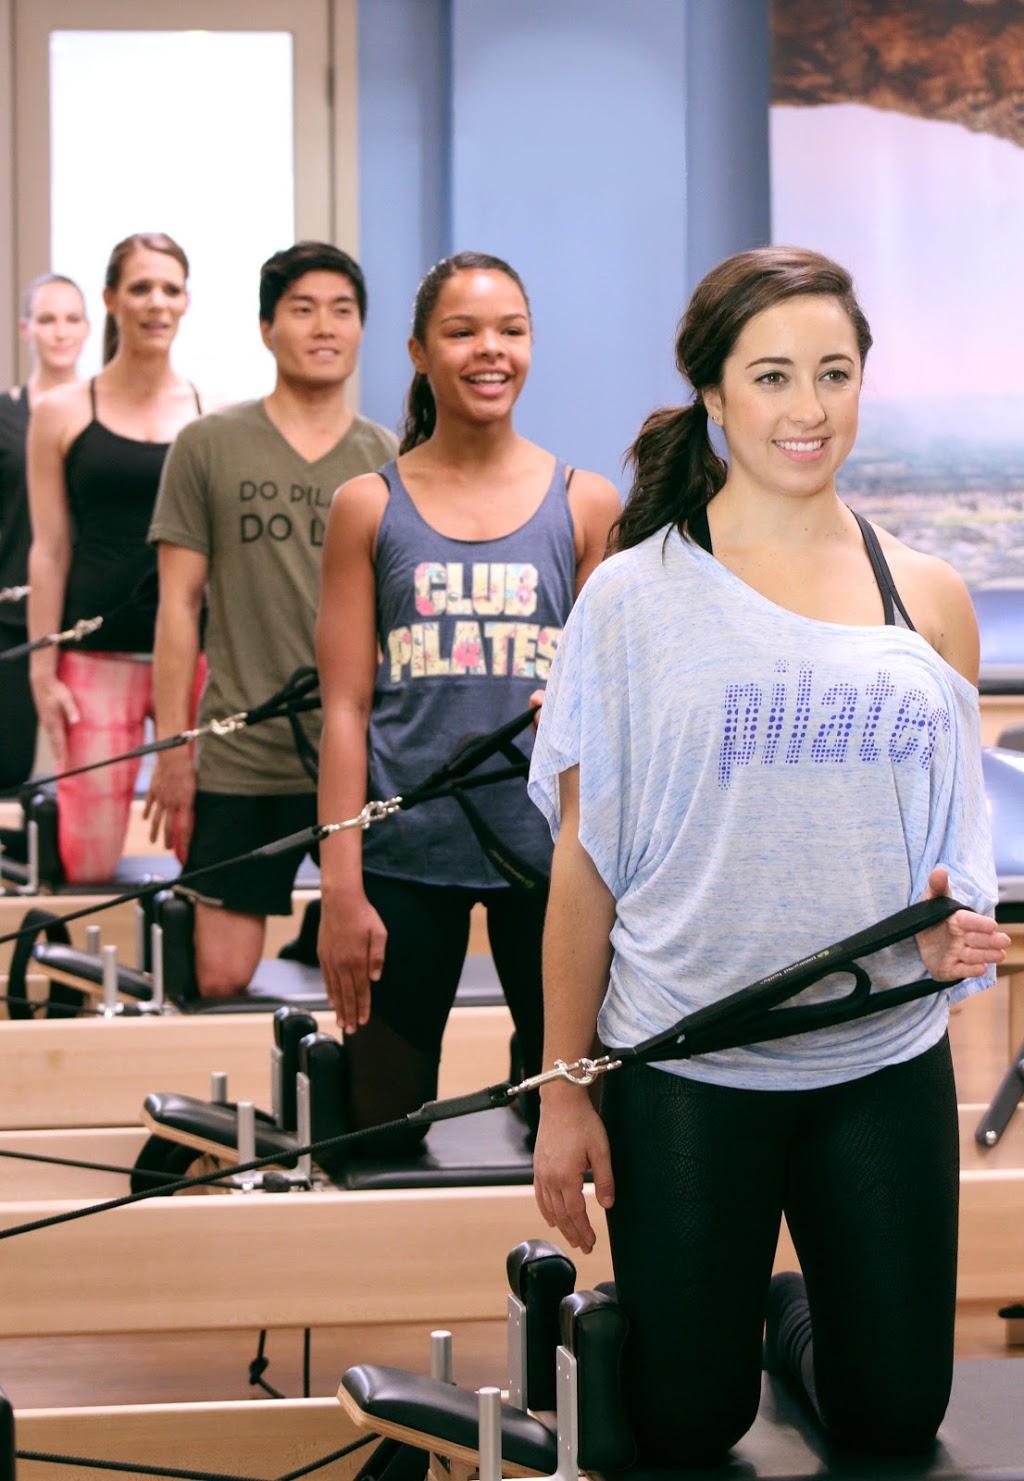 Club Pilates - gym  | Photo 6 of 10 | Address: 7947 Jericho Turnpike, Woodbury, NY 11797, USA | Phone: (646) 907-9626